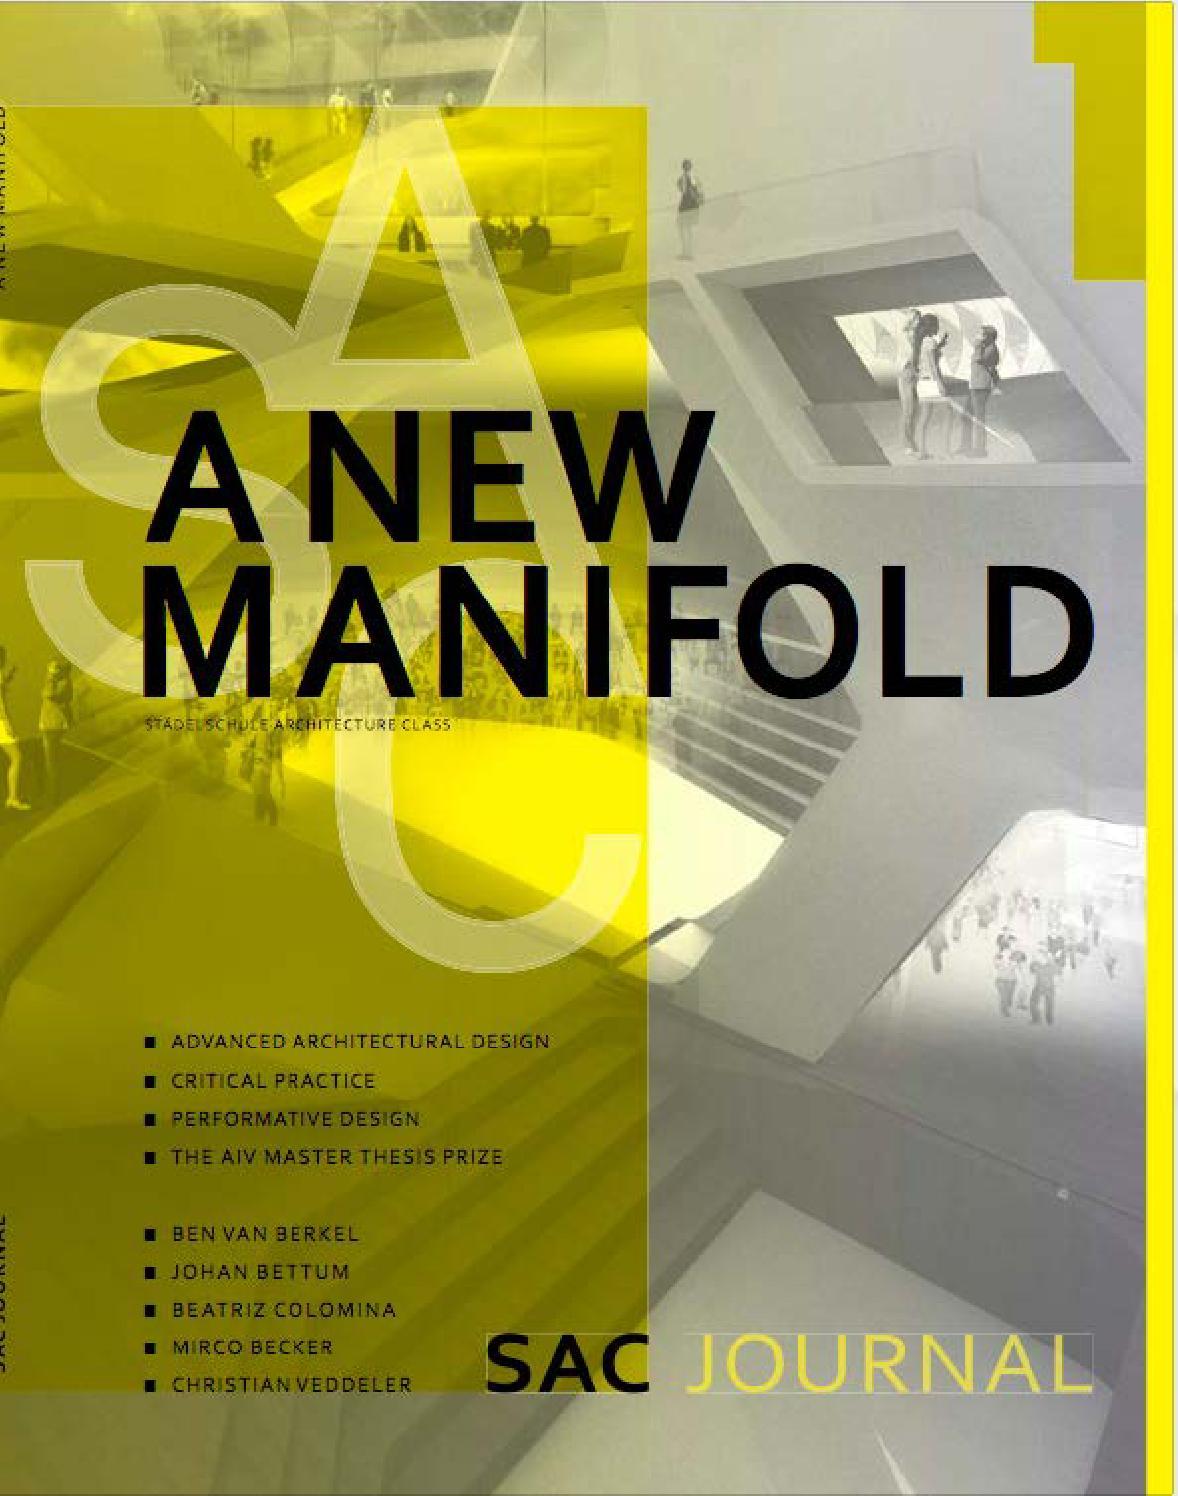 SAC 1 Journal   A New Manifold By A A D R   Issuu